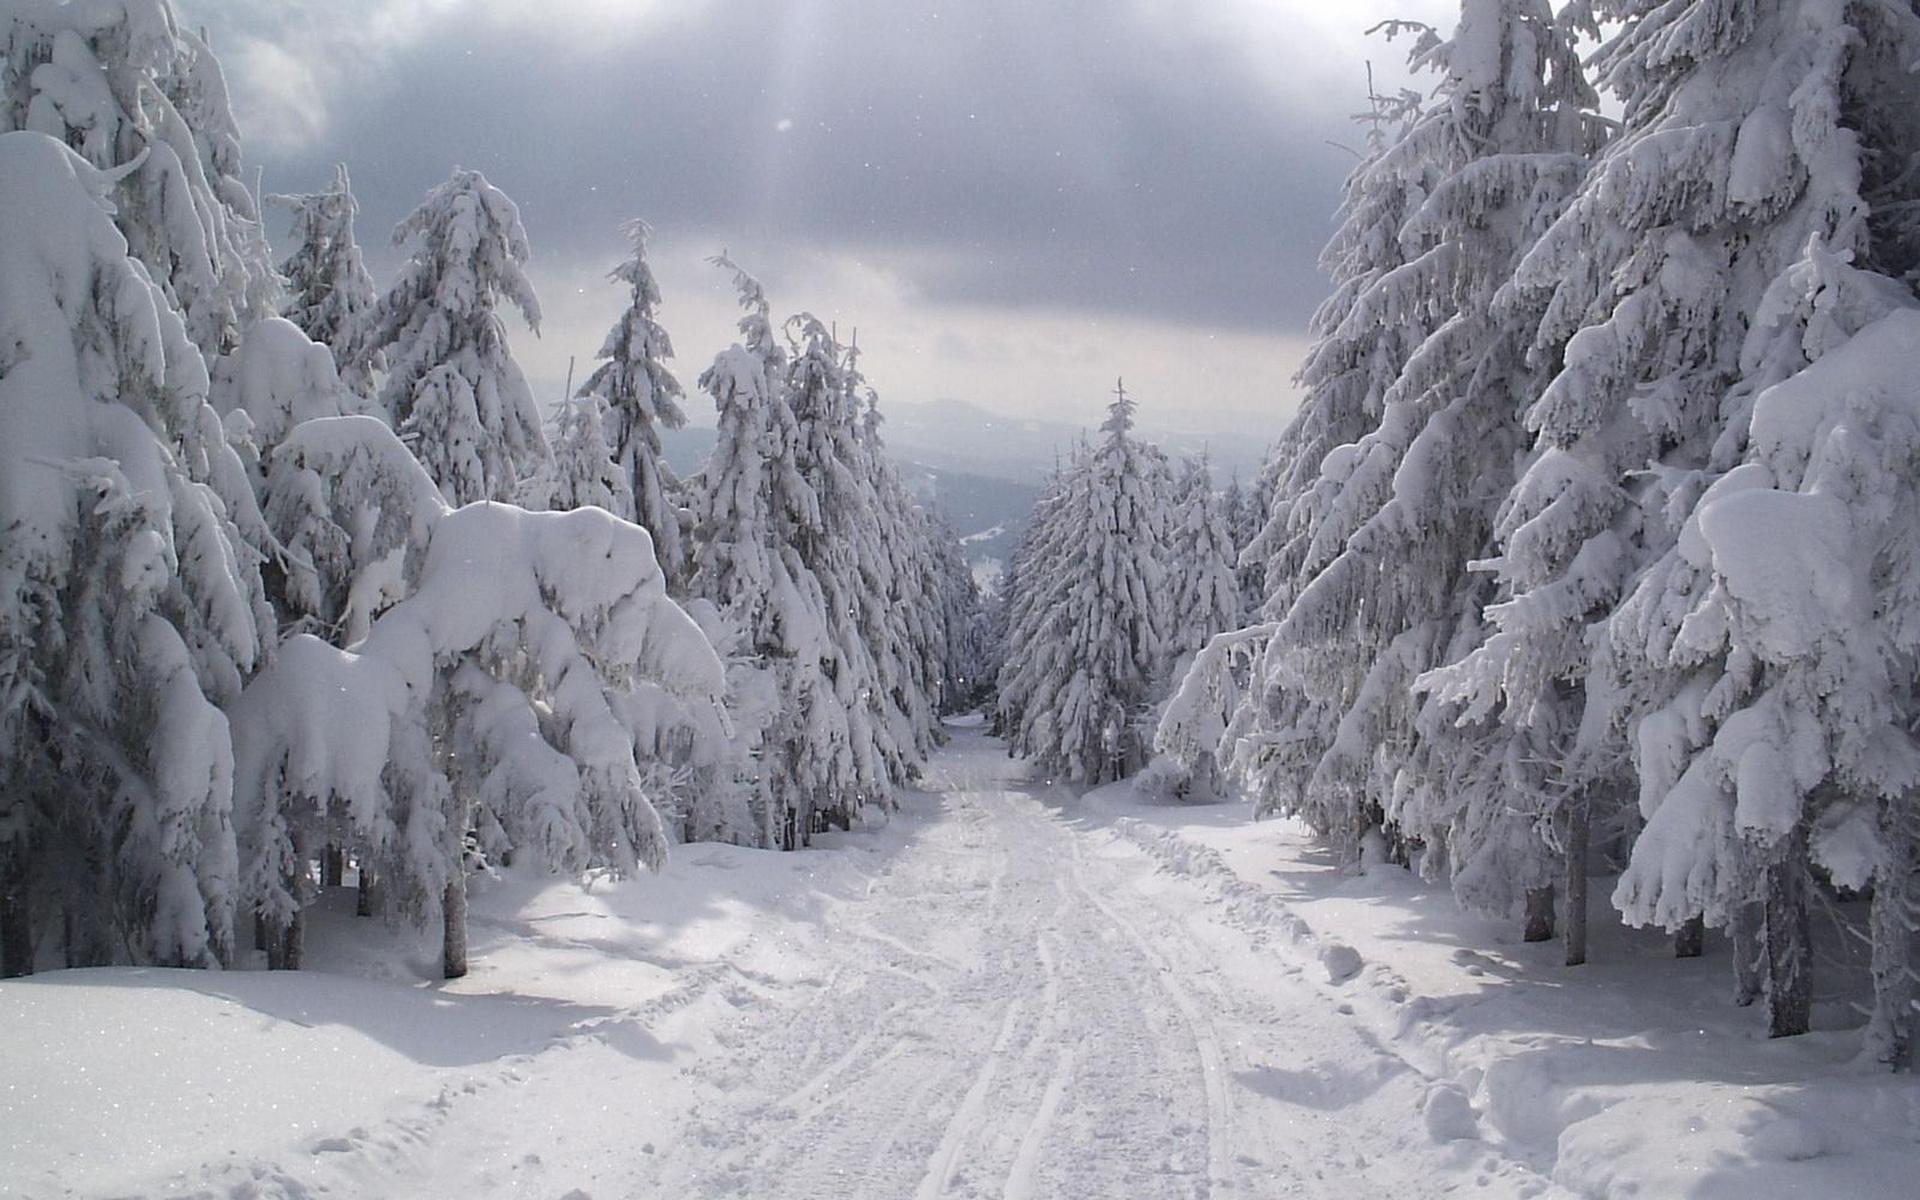 sfondi gratis per desktop paesaggi invernali sfondi